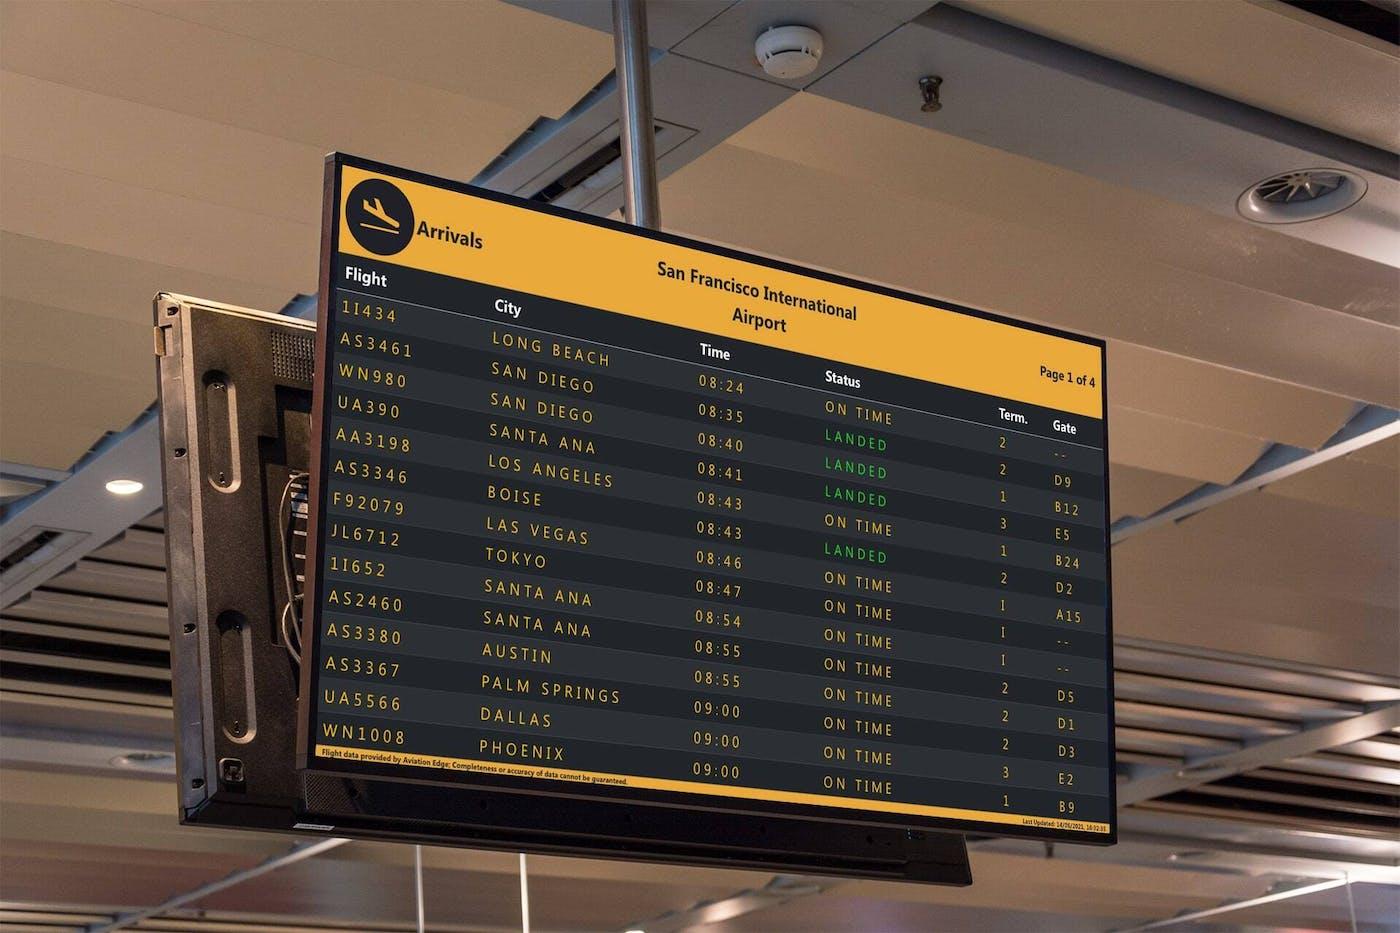 ScreenCloud Flight Schedule App Guide